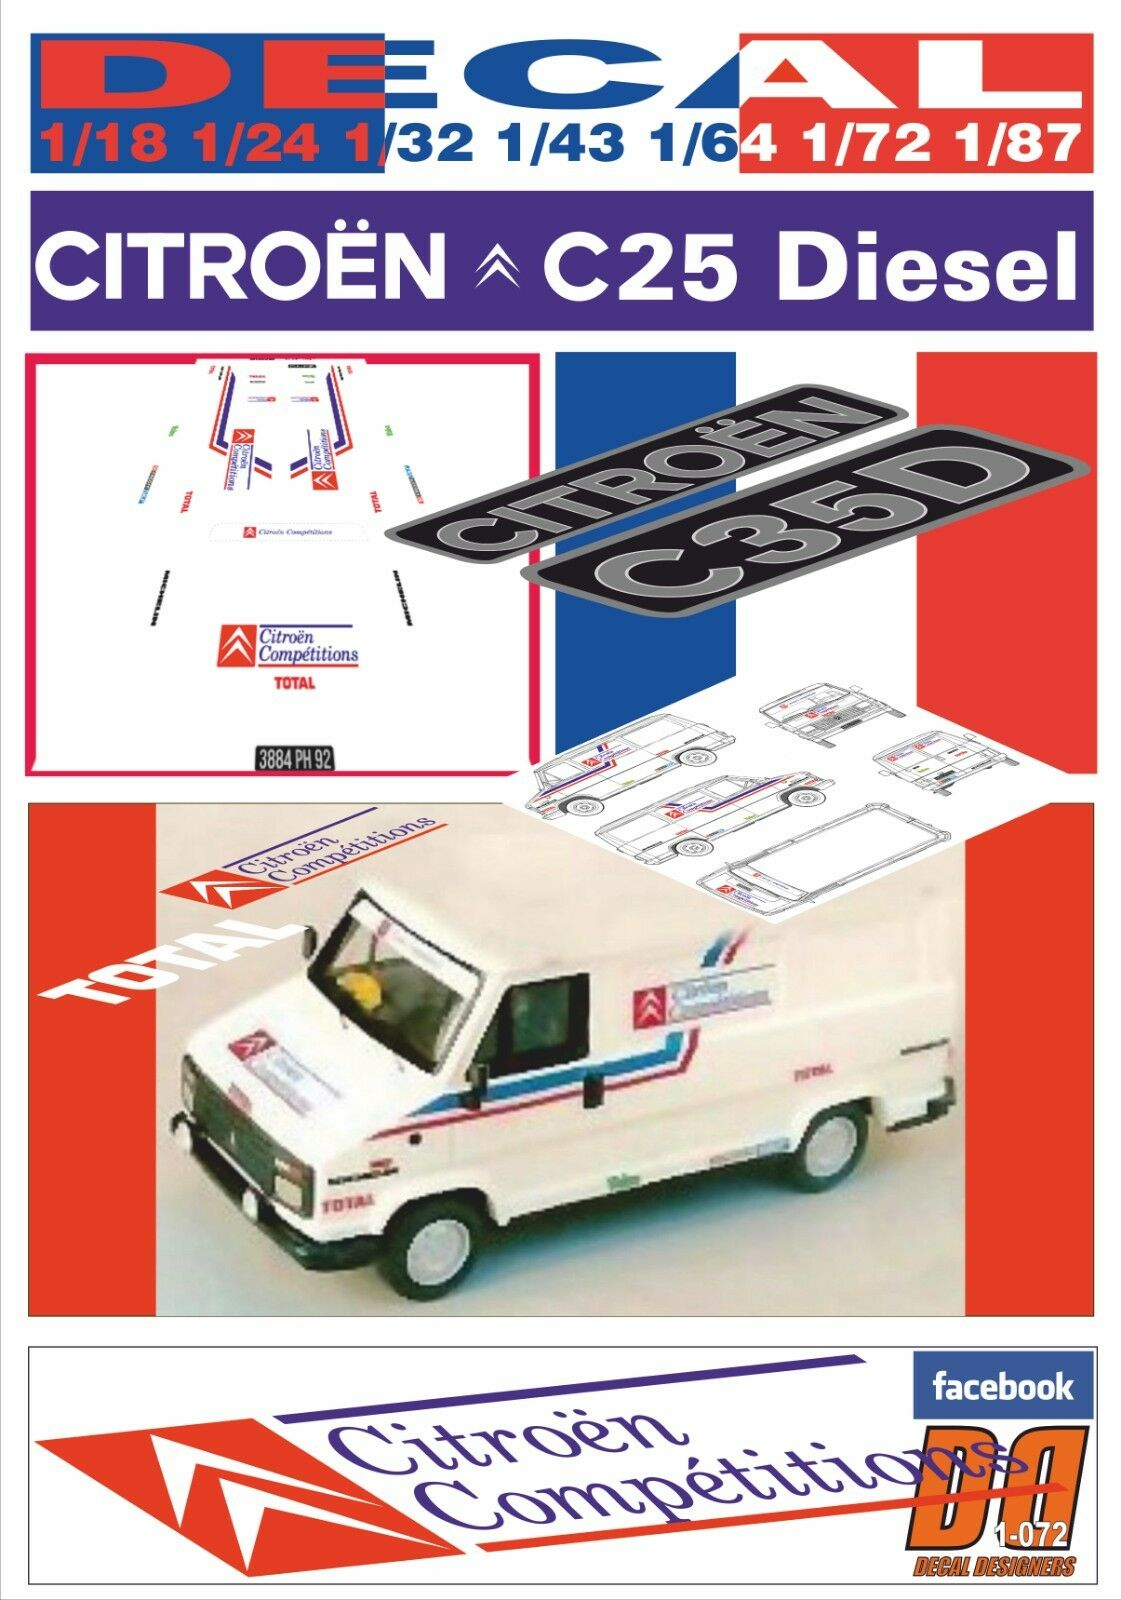 DECAL CITROEN C25D ASSISTANCE CITROEN COMPETITIONS 1988 (05)